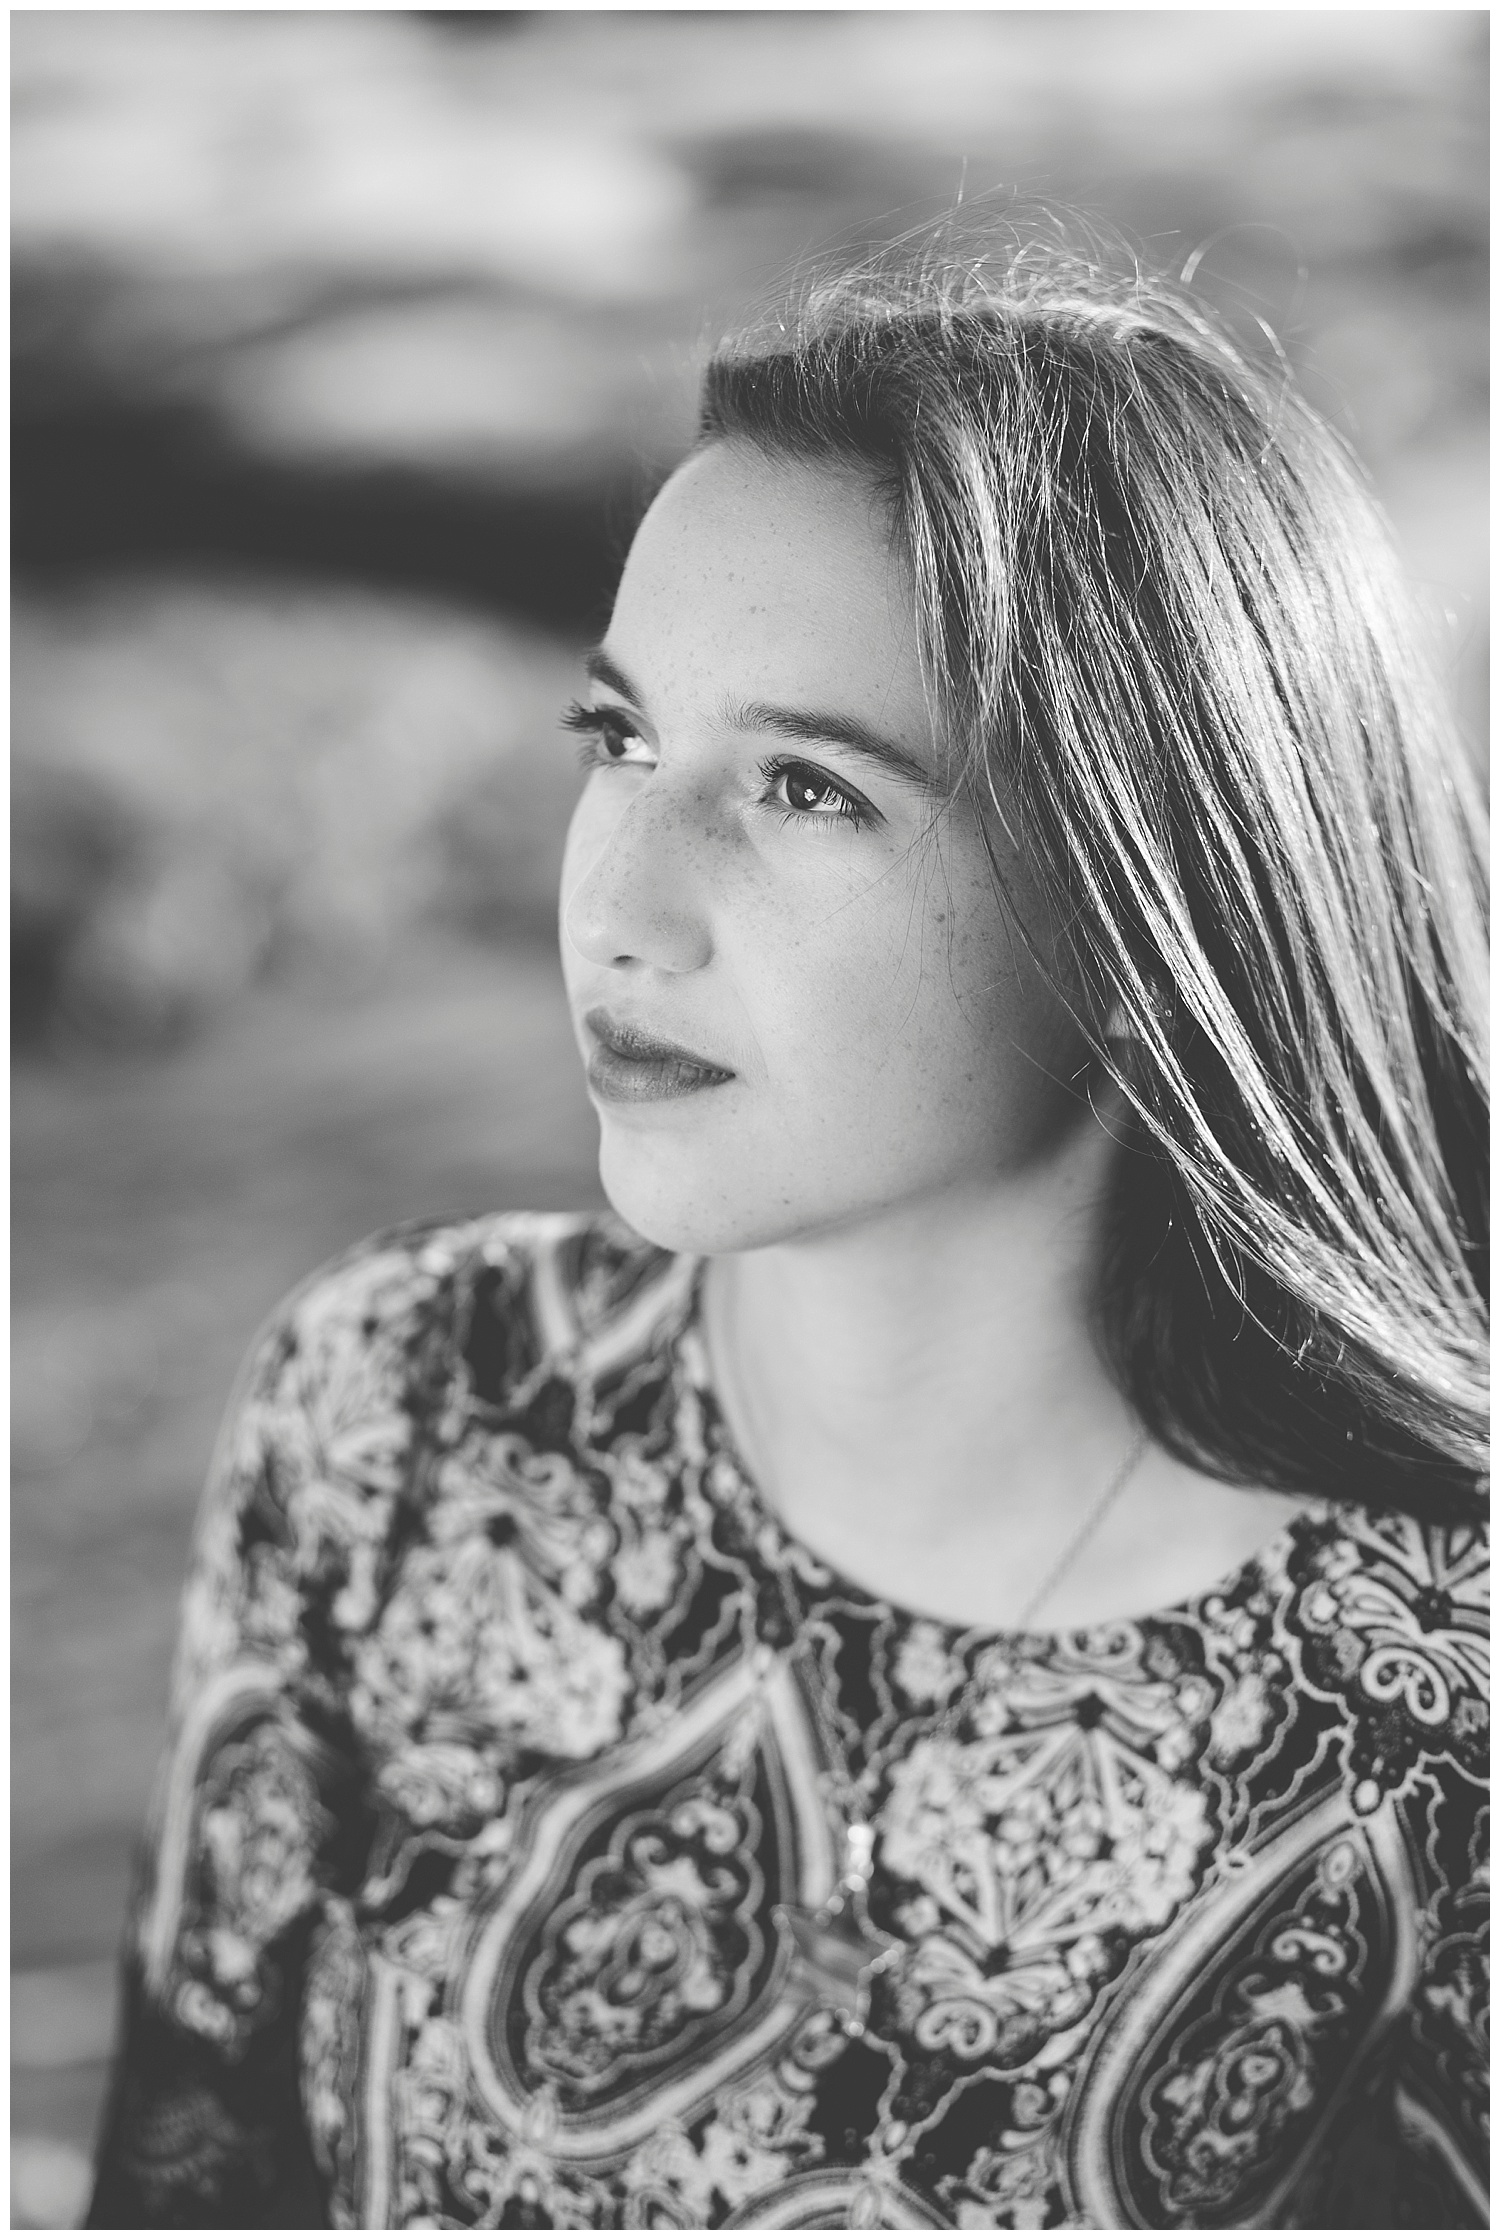 08292017_MayaH_High School Senior Photography_Renoda Campbell Photography-8312.jpg